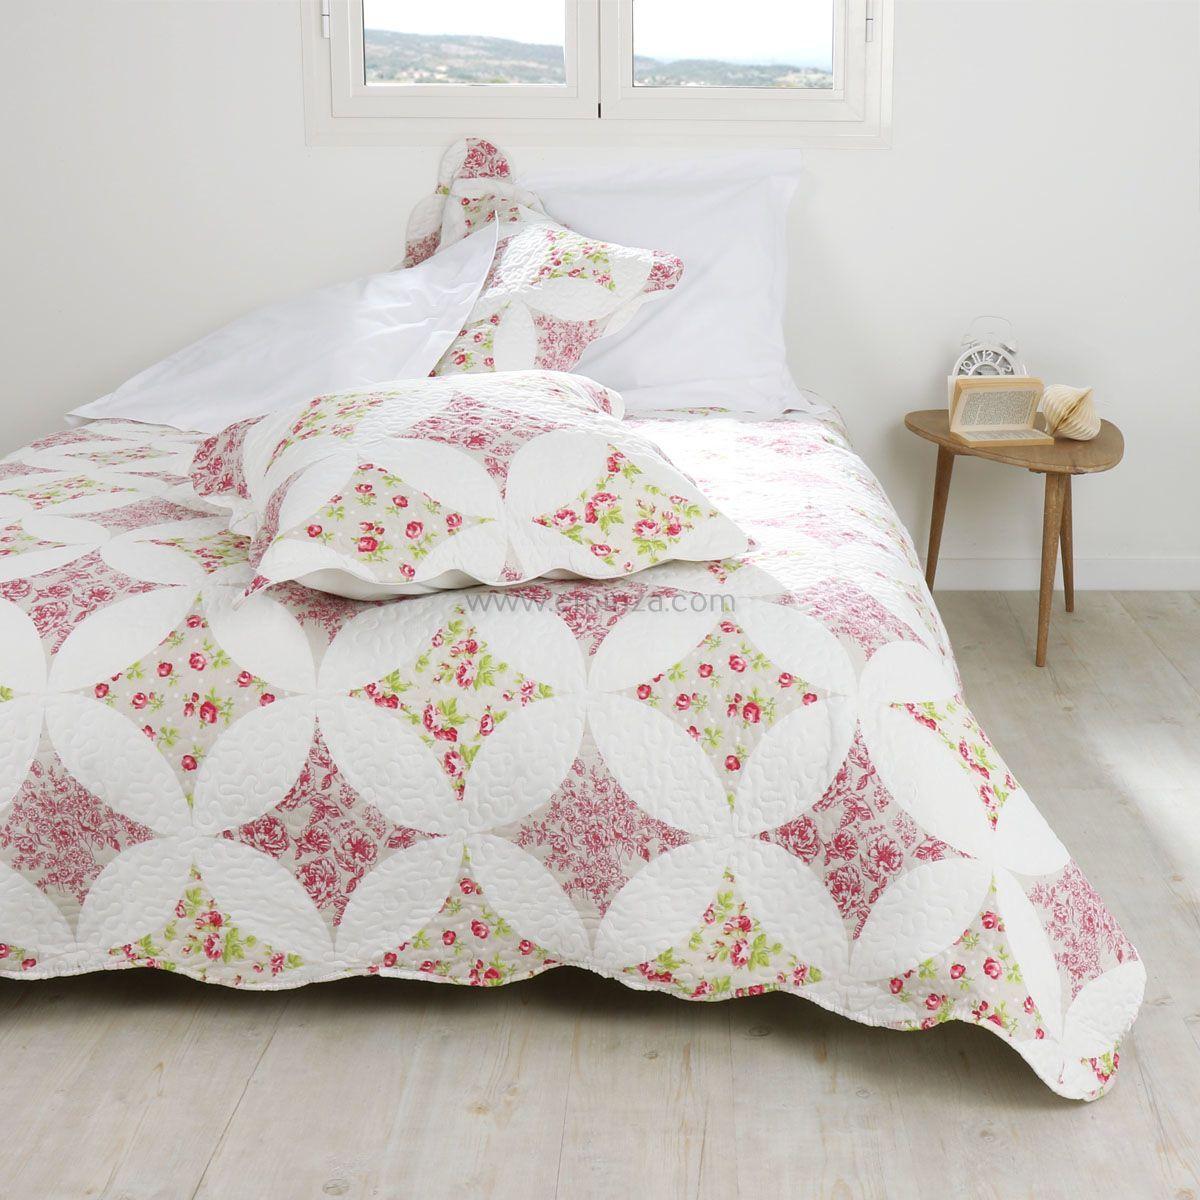 boutis et taies d 39 oreiller 220 x 240 cm rozane rose couvre lit boutis eminza. Black Bedroom Furniture Sets. Home Design Ideas